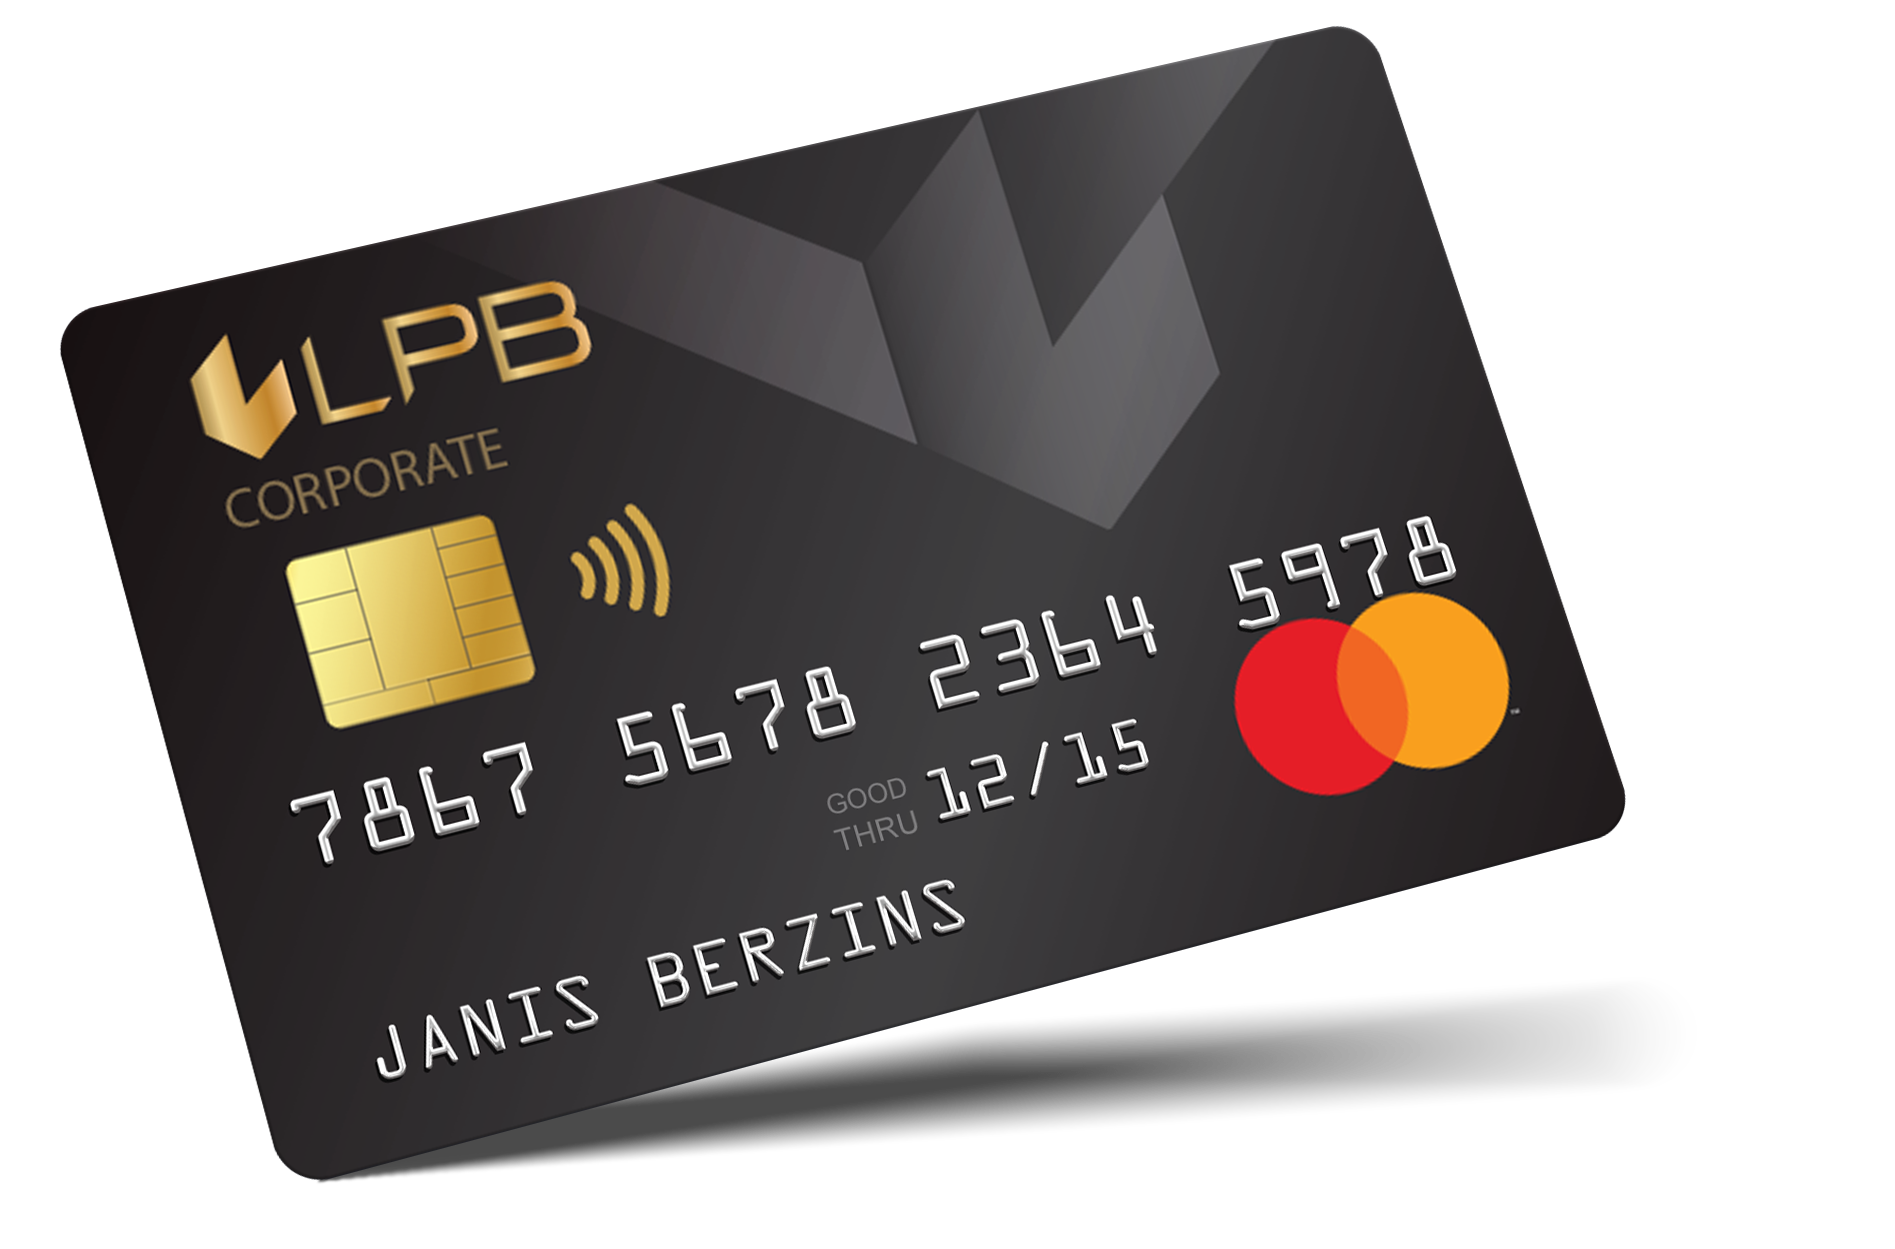 lpb card